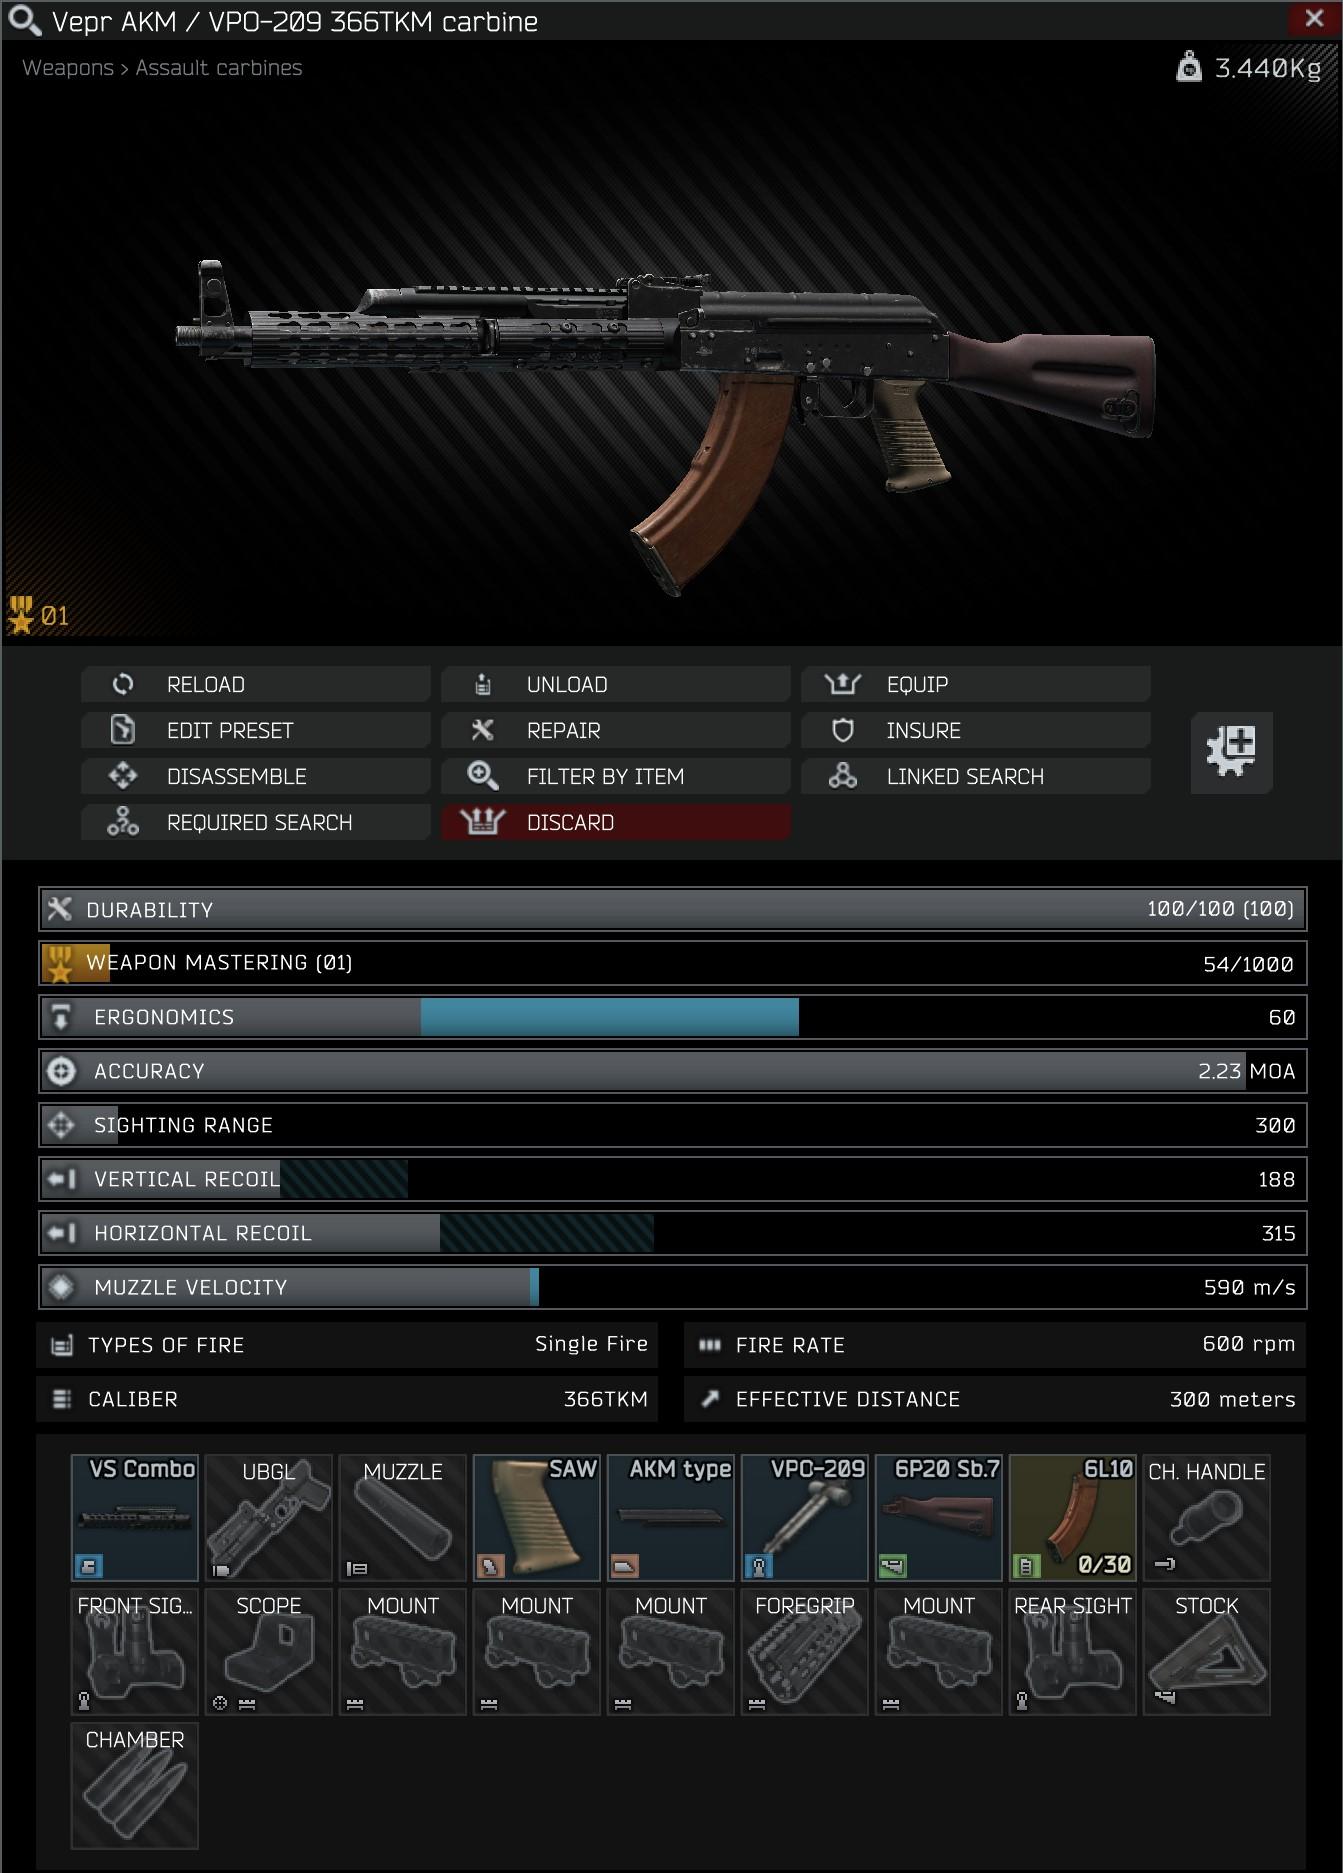 VPO-209_Guard customo_1.jpg